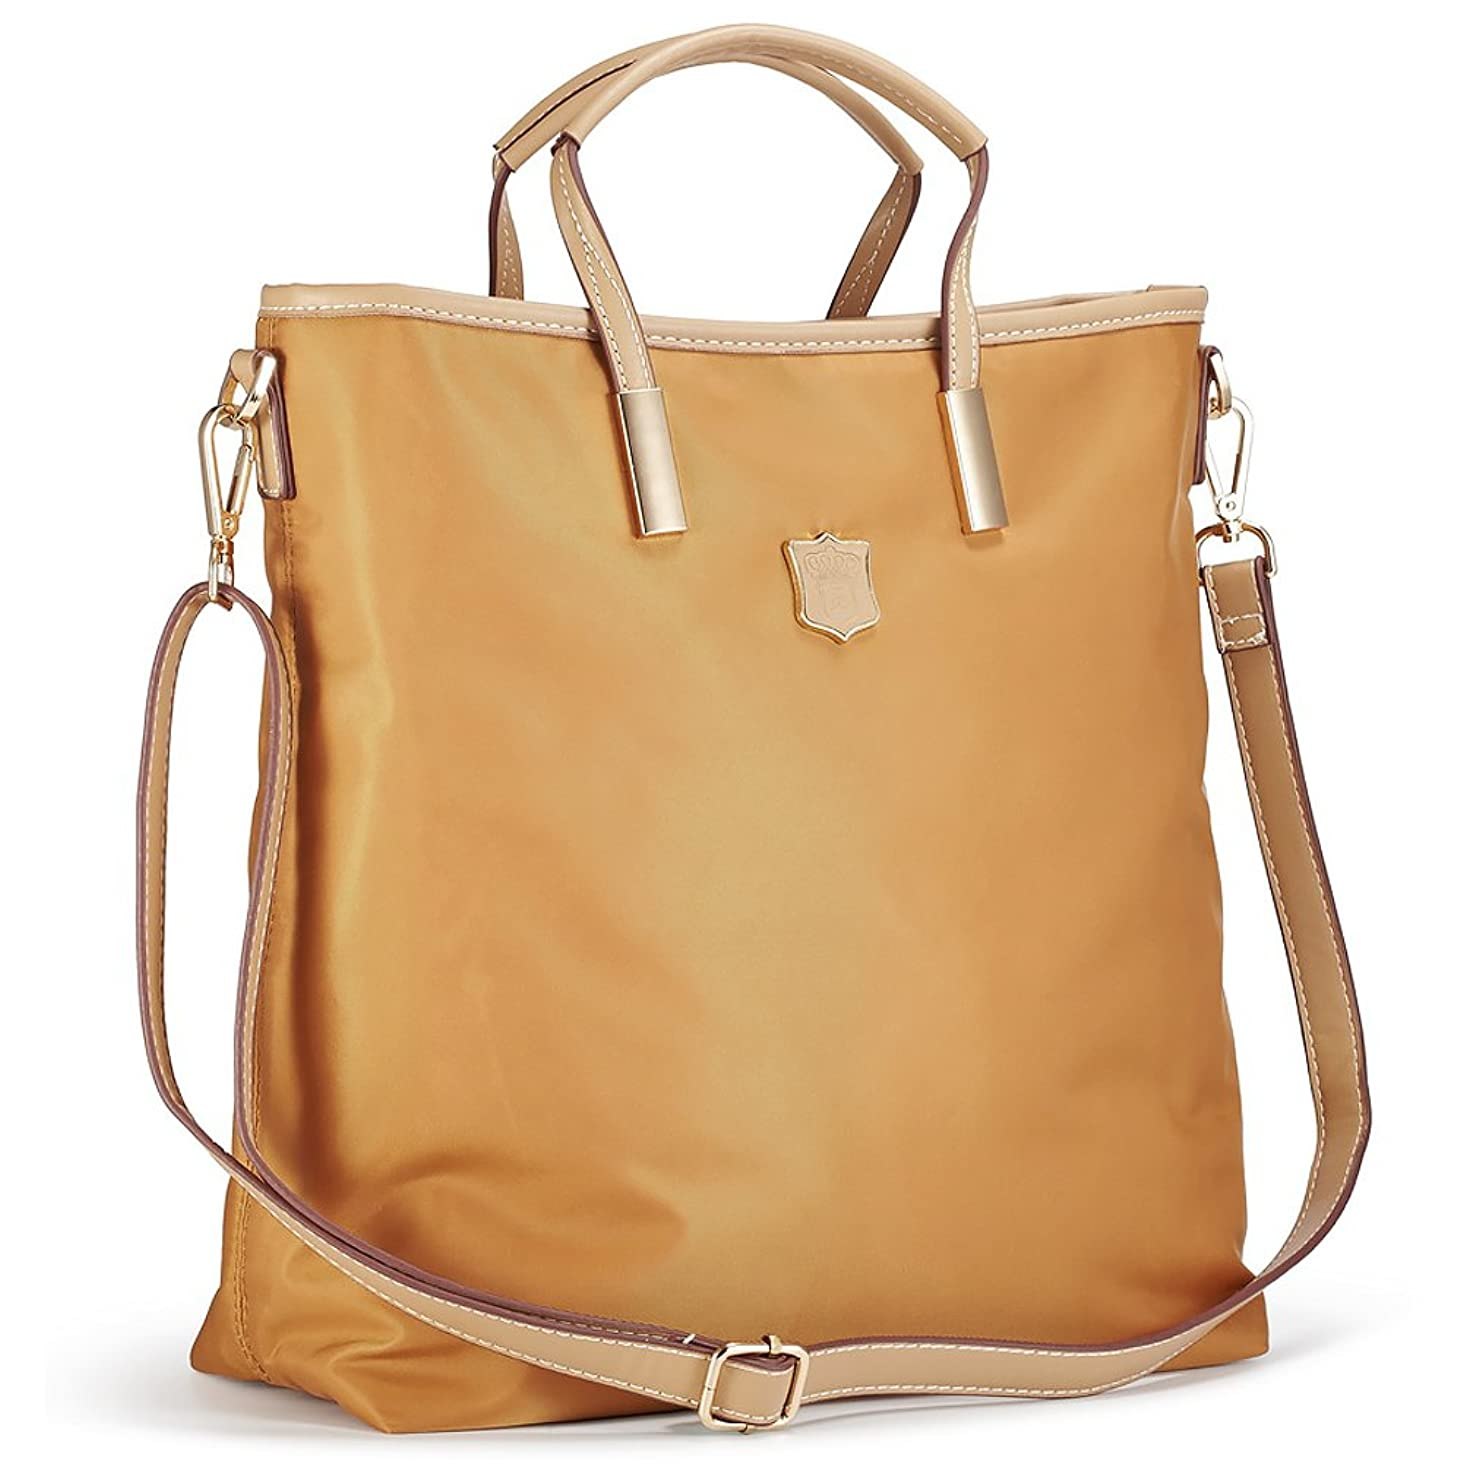 Lecxci Women's Oxford Nylon Large Capacity Waterproof Tote Bag Satchel Multi-pocket Shoulder Travel Bags for Women